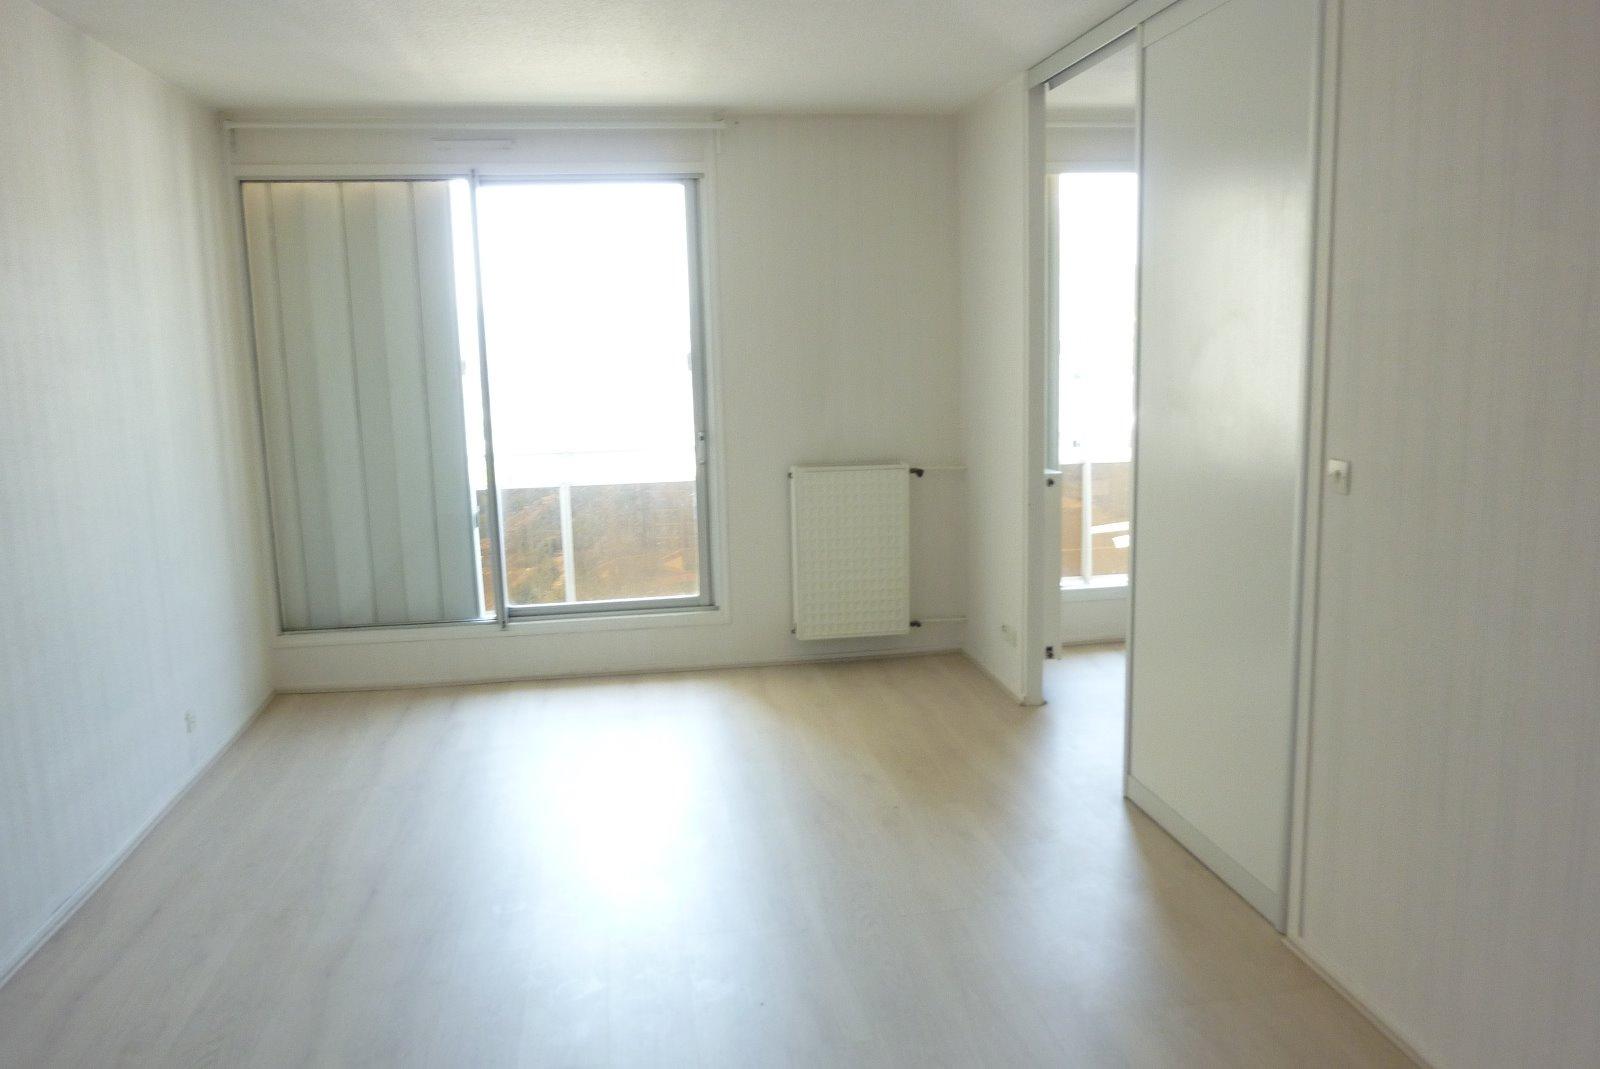 annonce vente appartement clermont ferrand 63100 67 m 59 000 992738370111. Black Bedroom Furniture Sets. Home Design Ideas